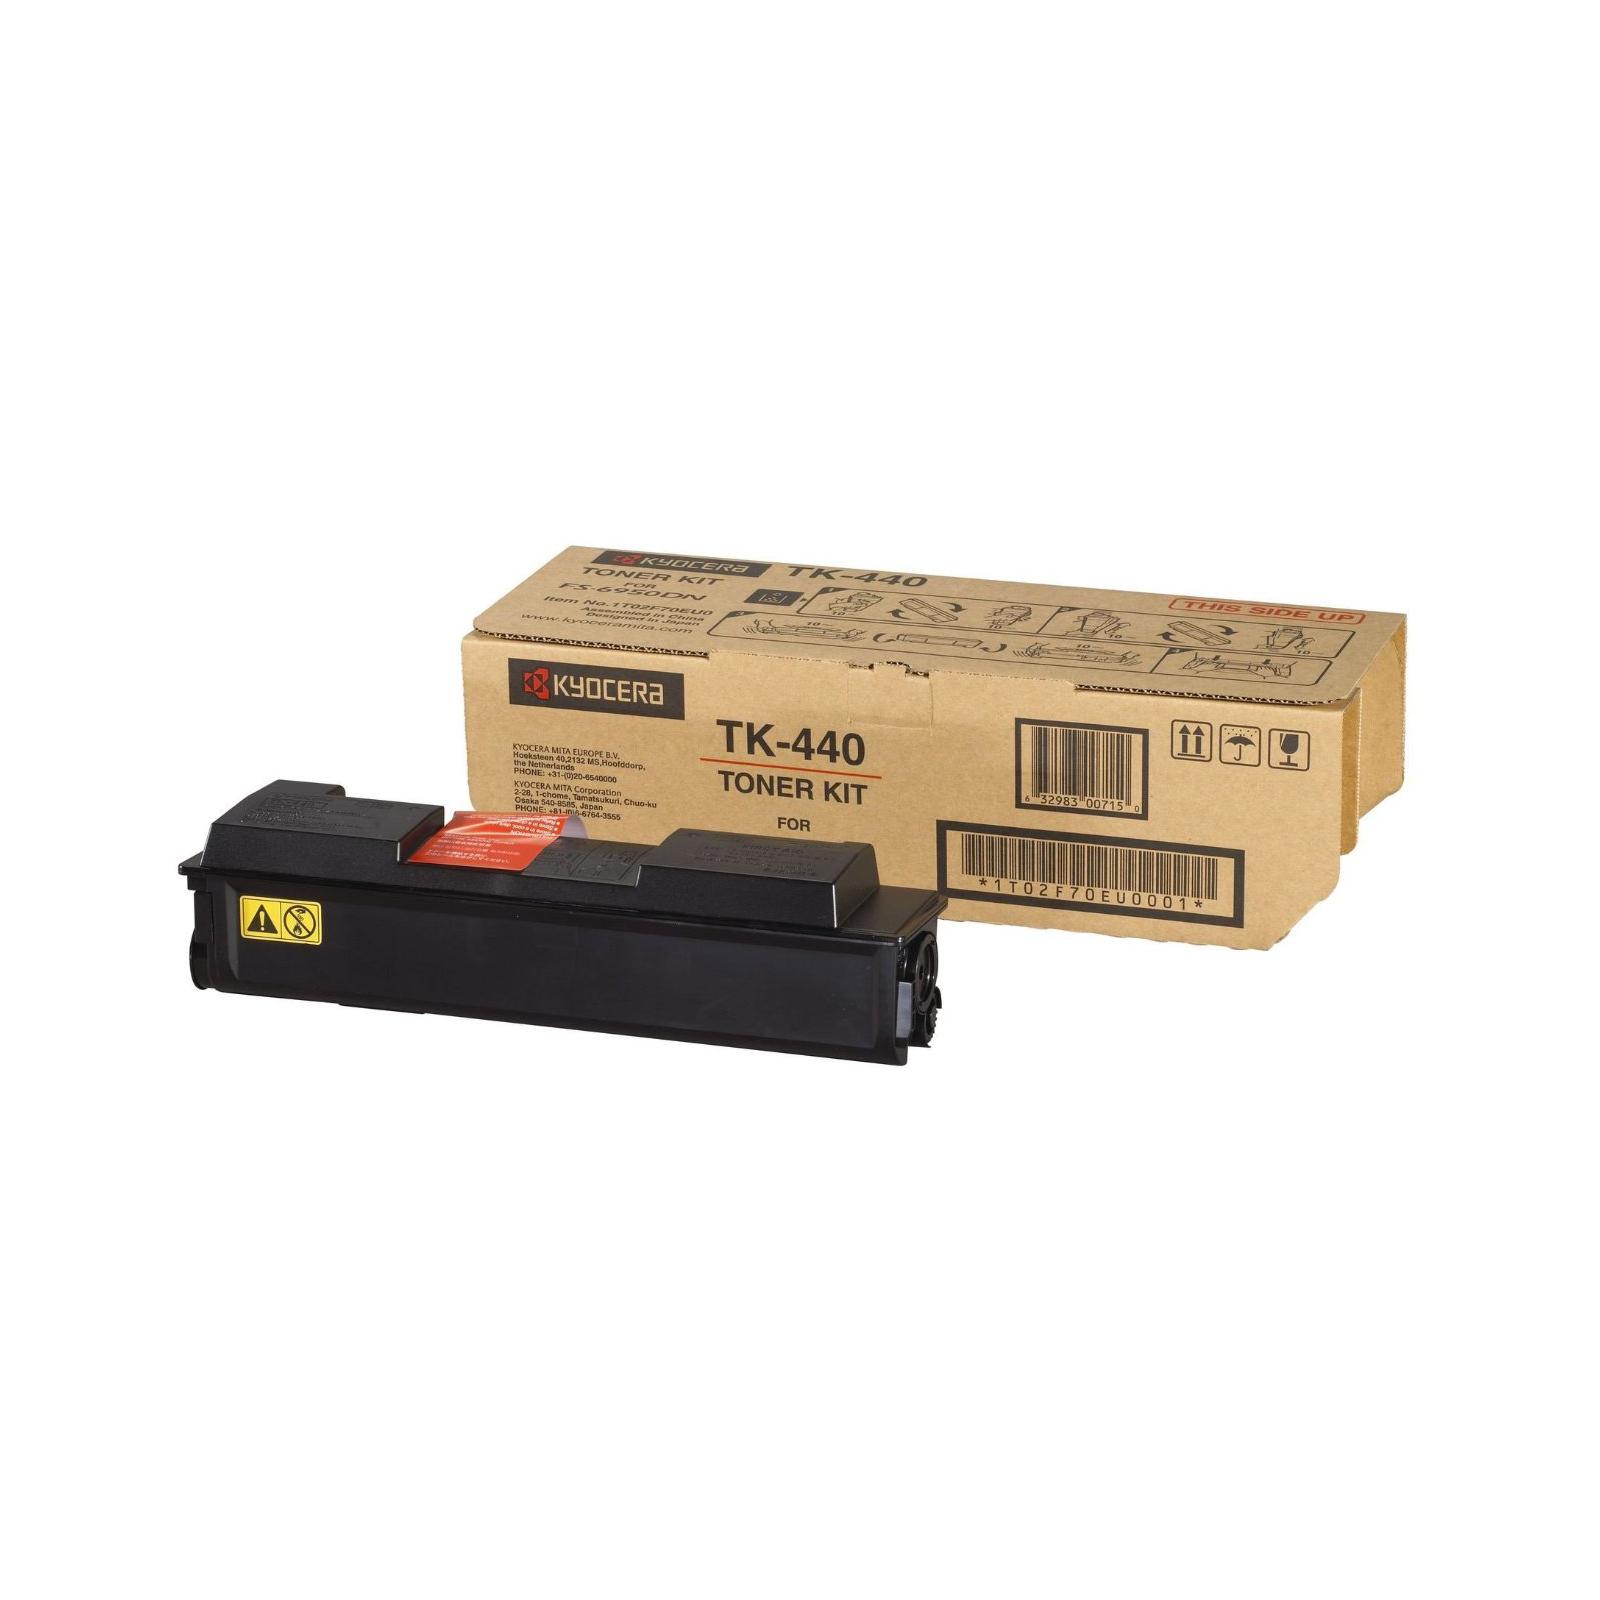 Тонер-картридж Kyocera TK-440, Для FS-6950 (1T02F70EU0)